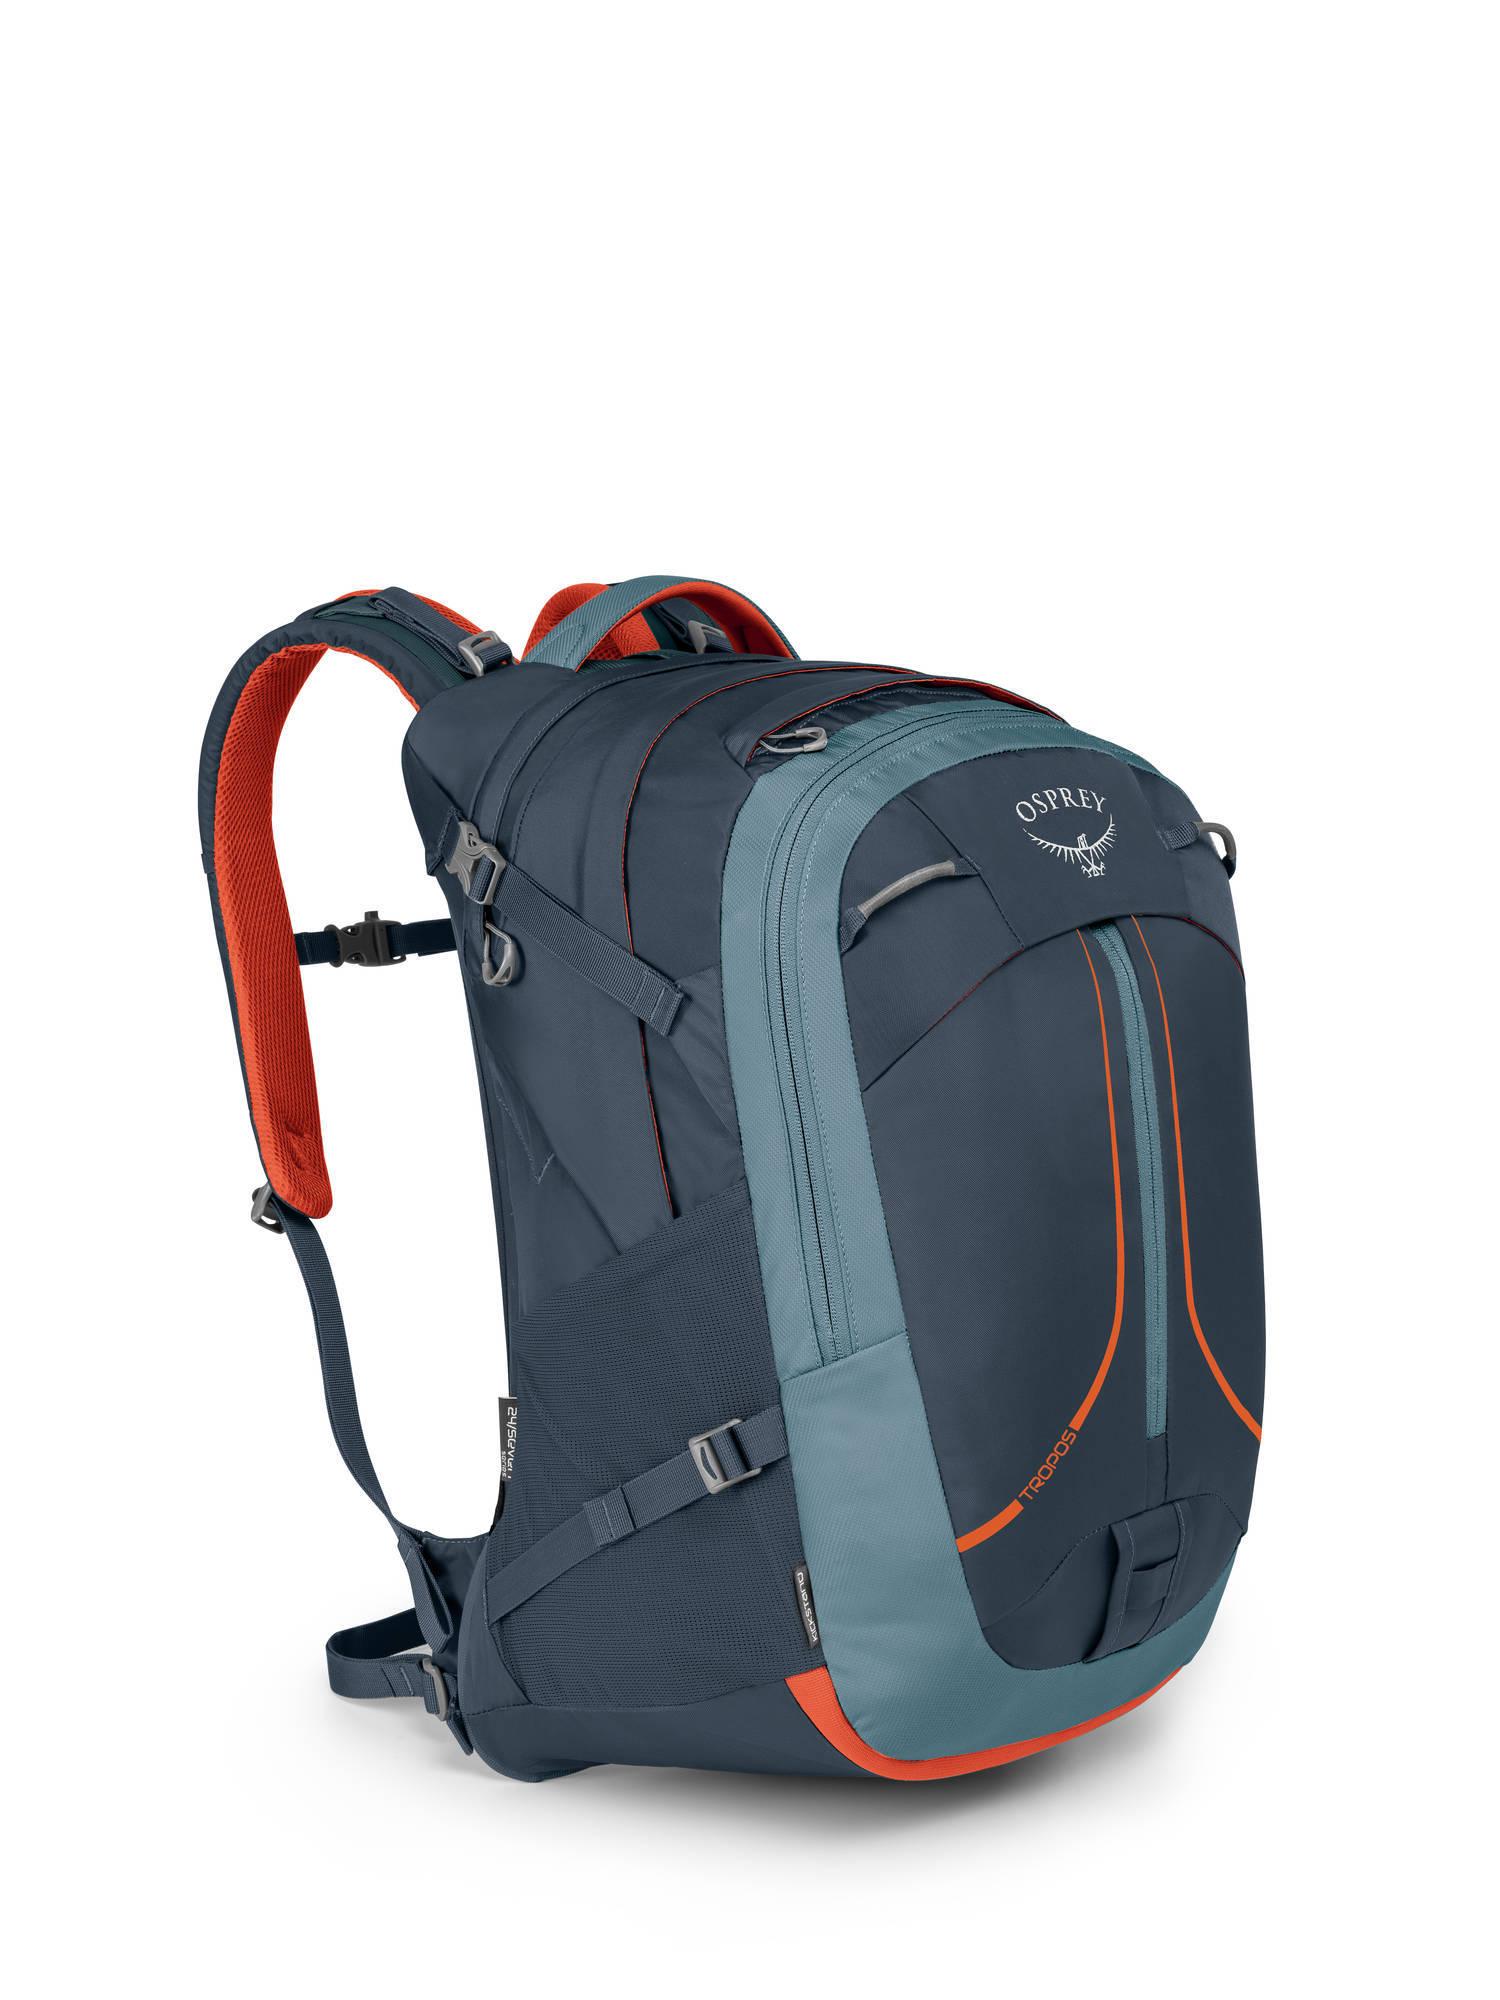 Городские рюкзаки Рюкзак Osprey Tropos 32 Amour Grey Tropos_F17_Side_Armor_Grey_web.jpg